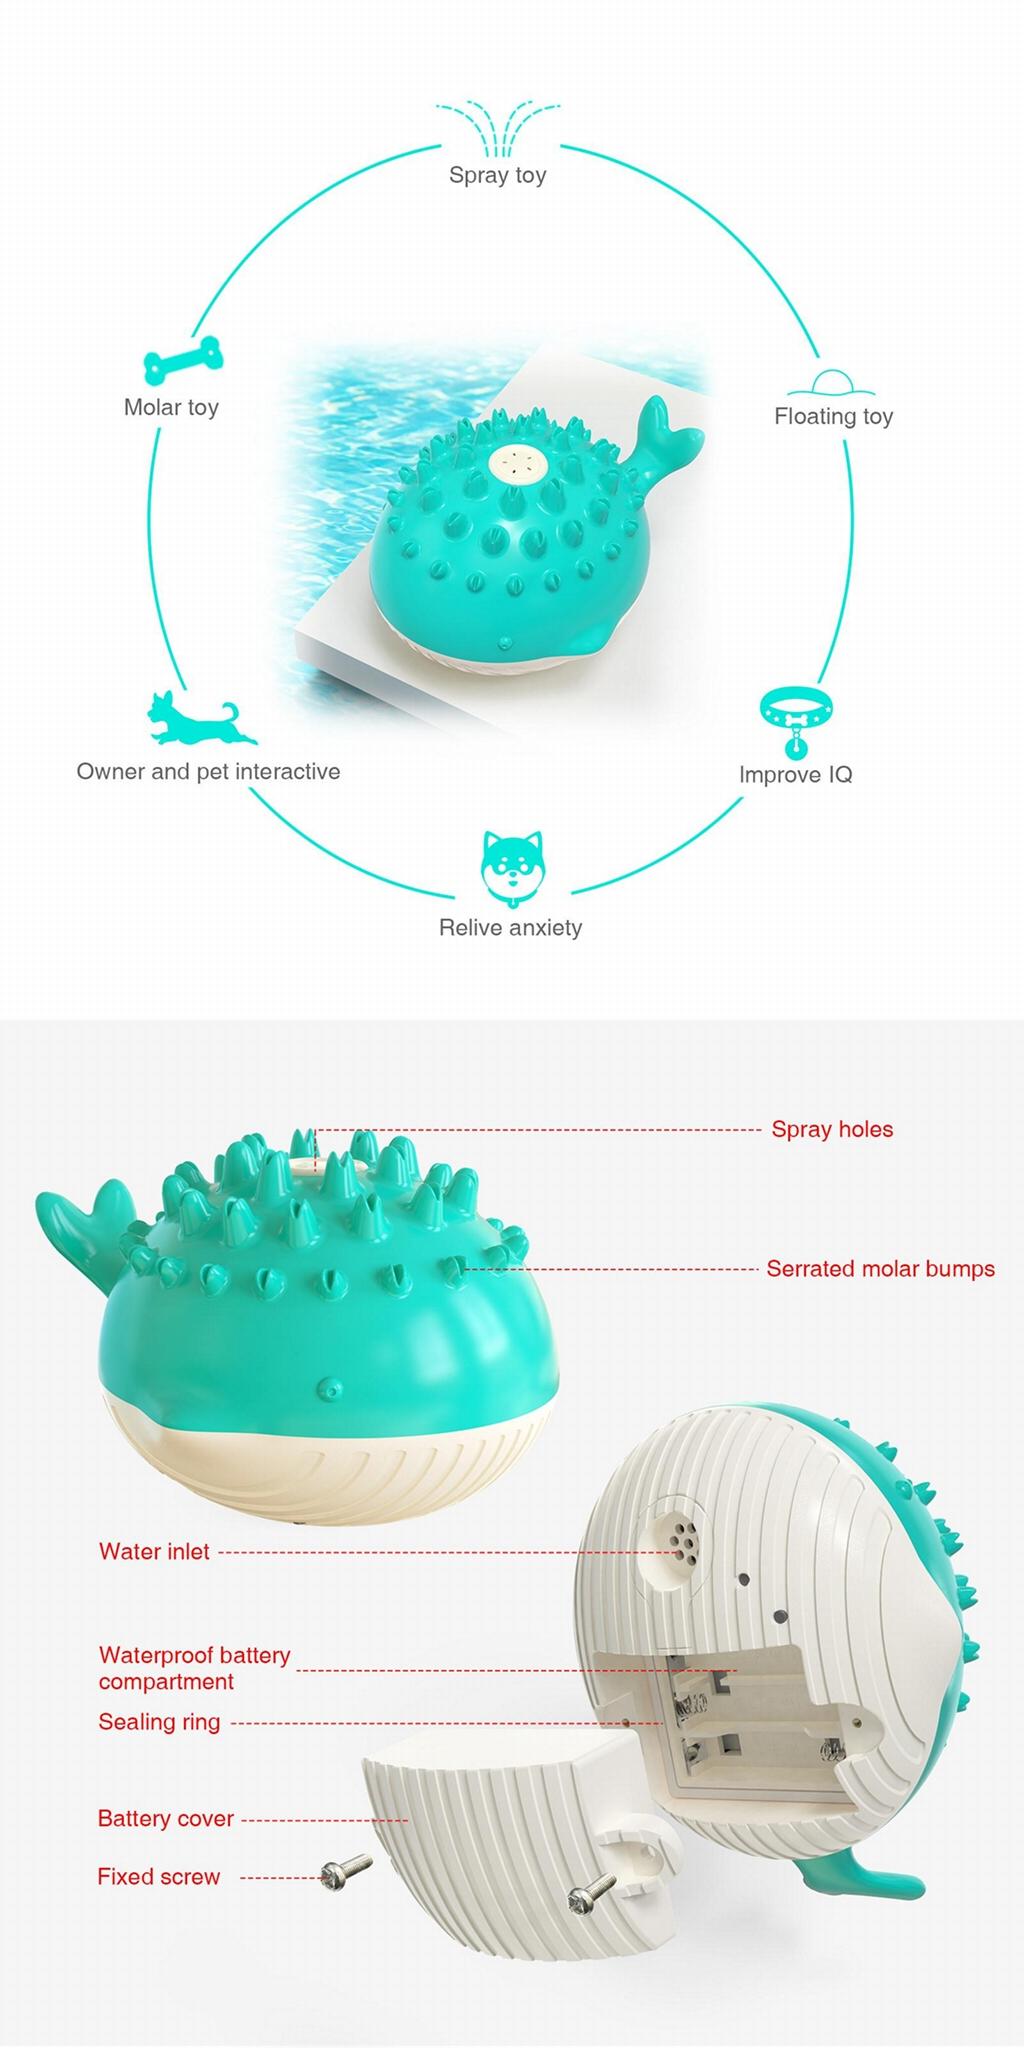 Spray toy Floating toy Pet Molar toy 2